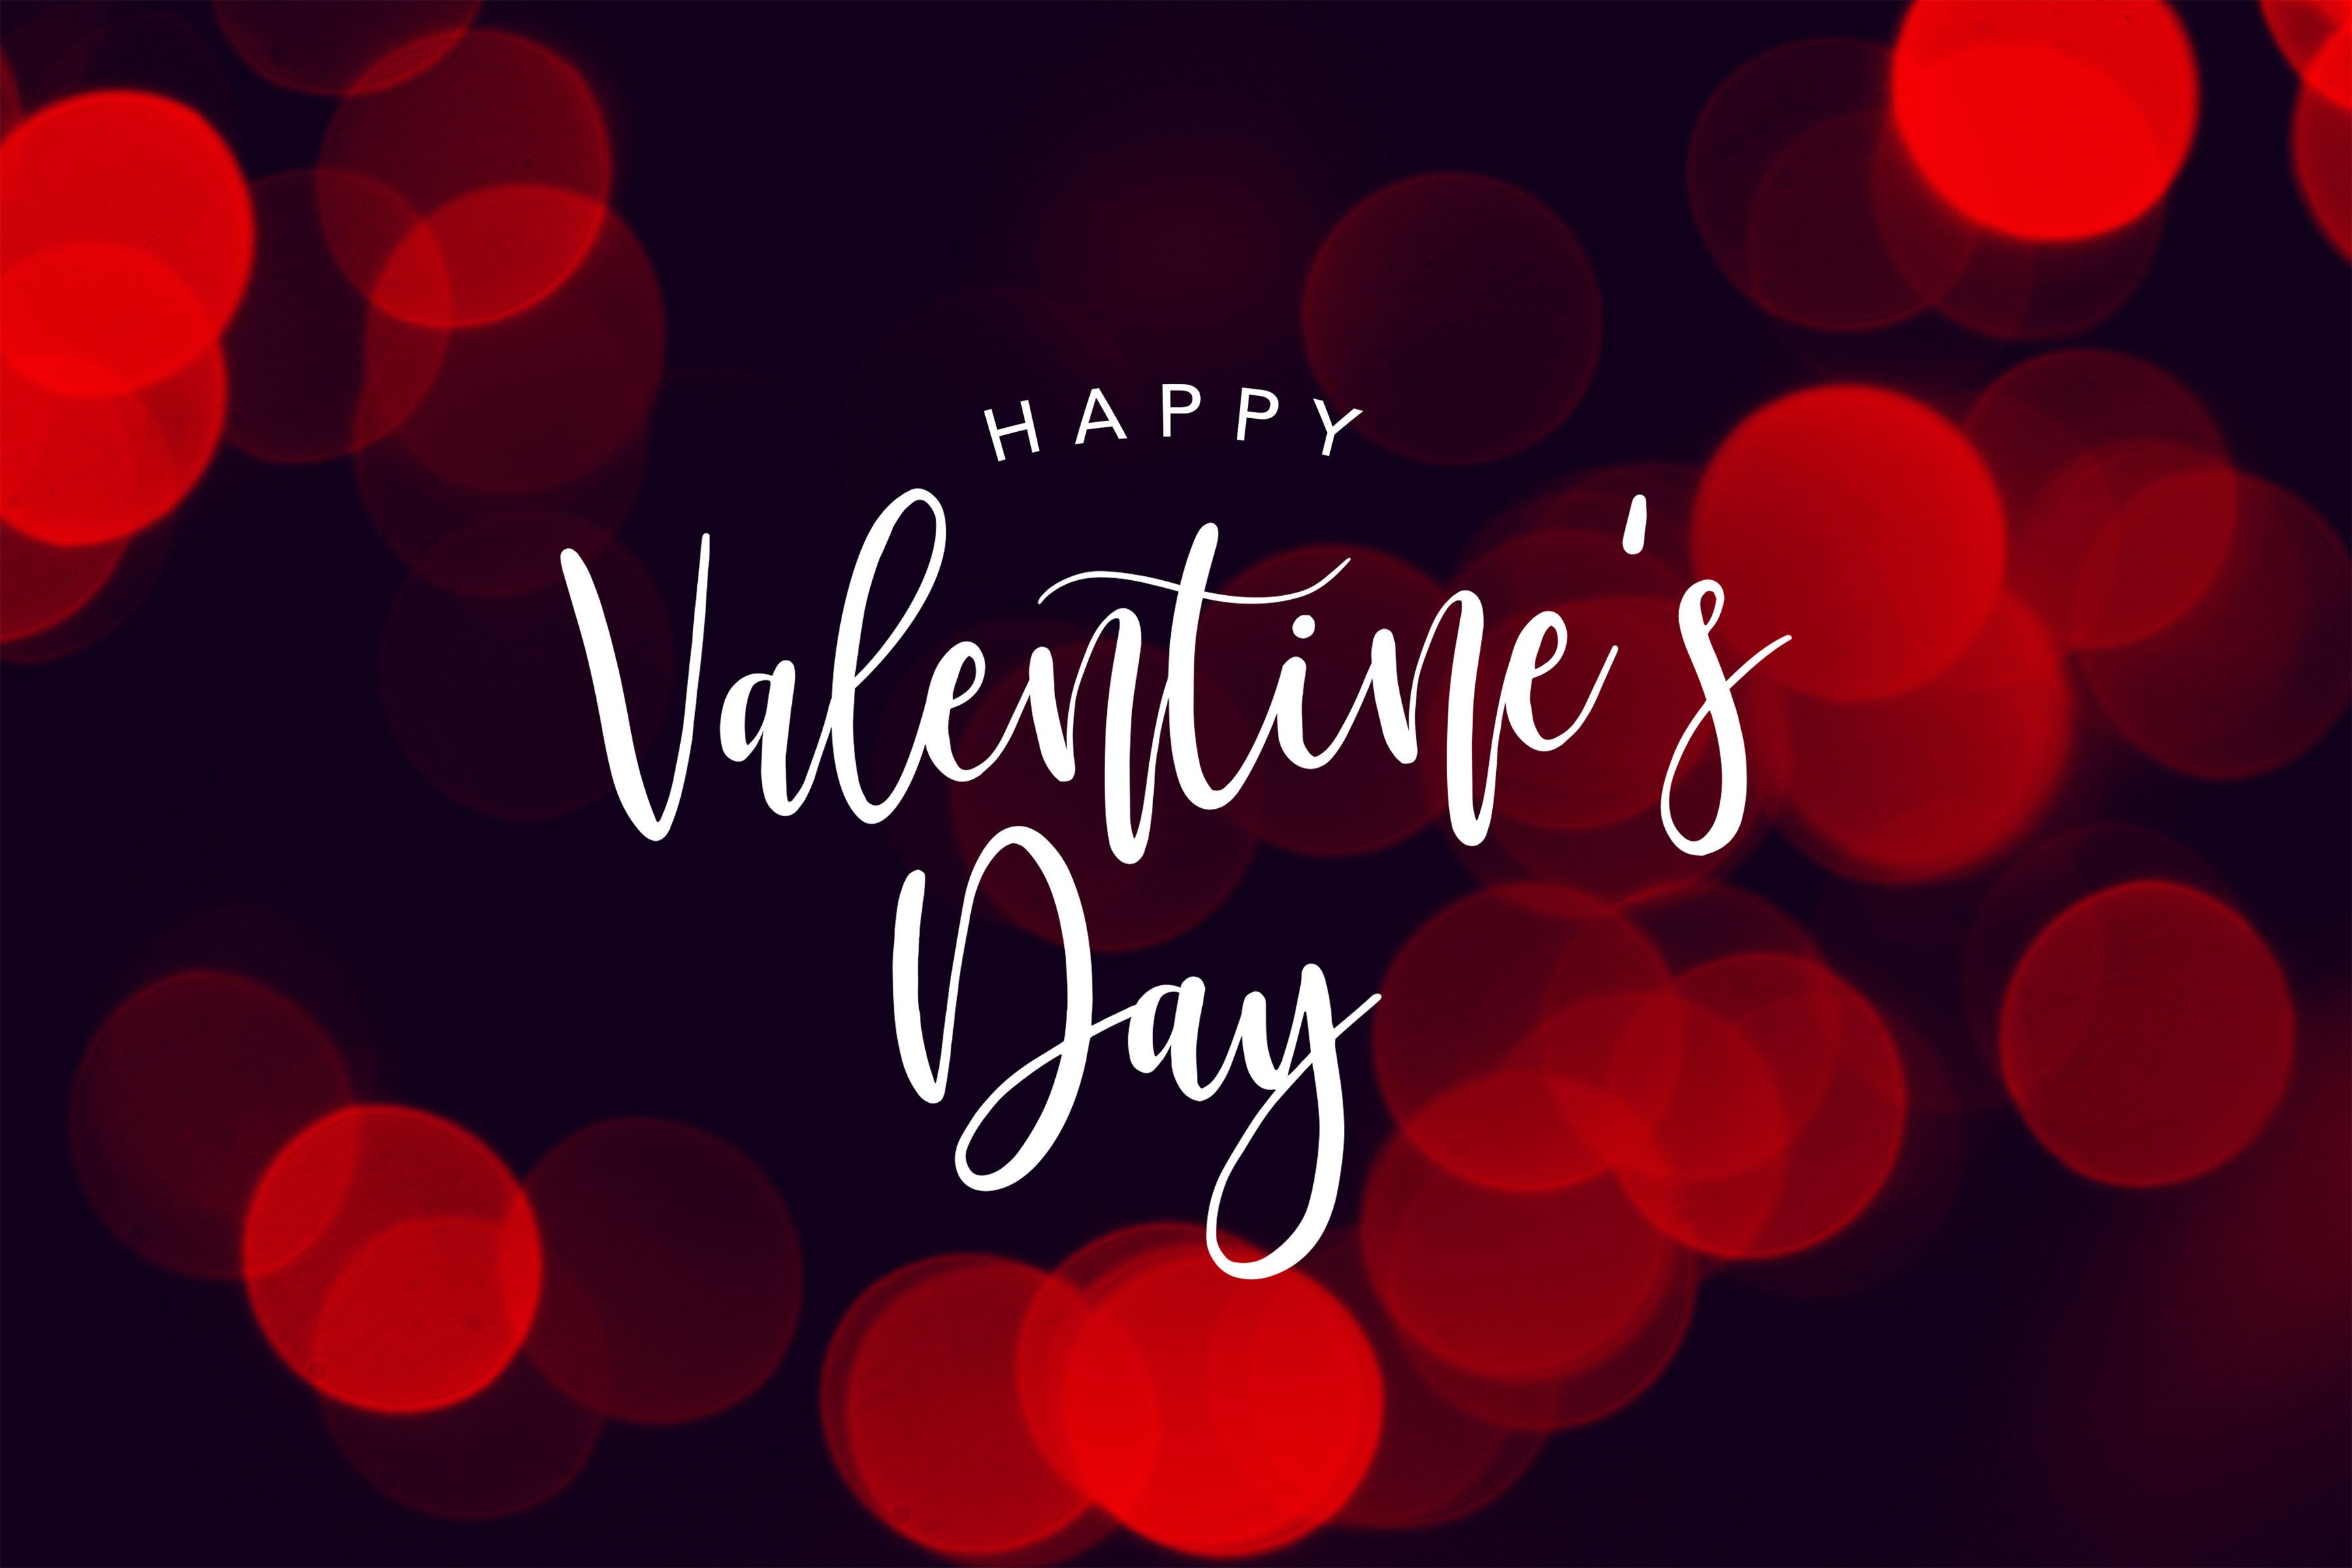 План действий на День святого Валентина